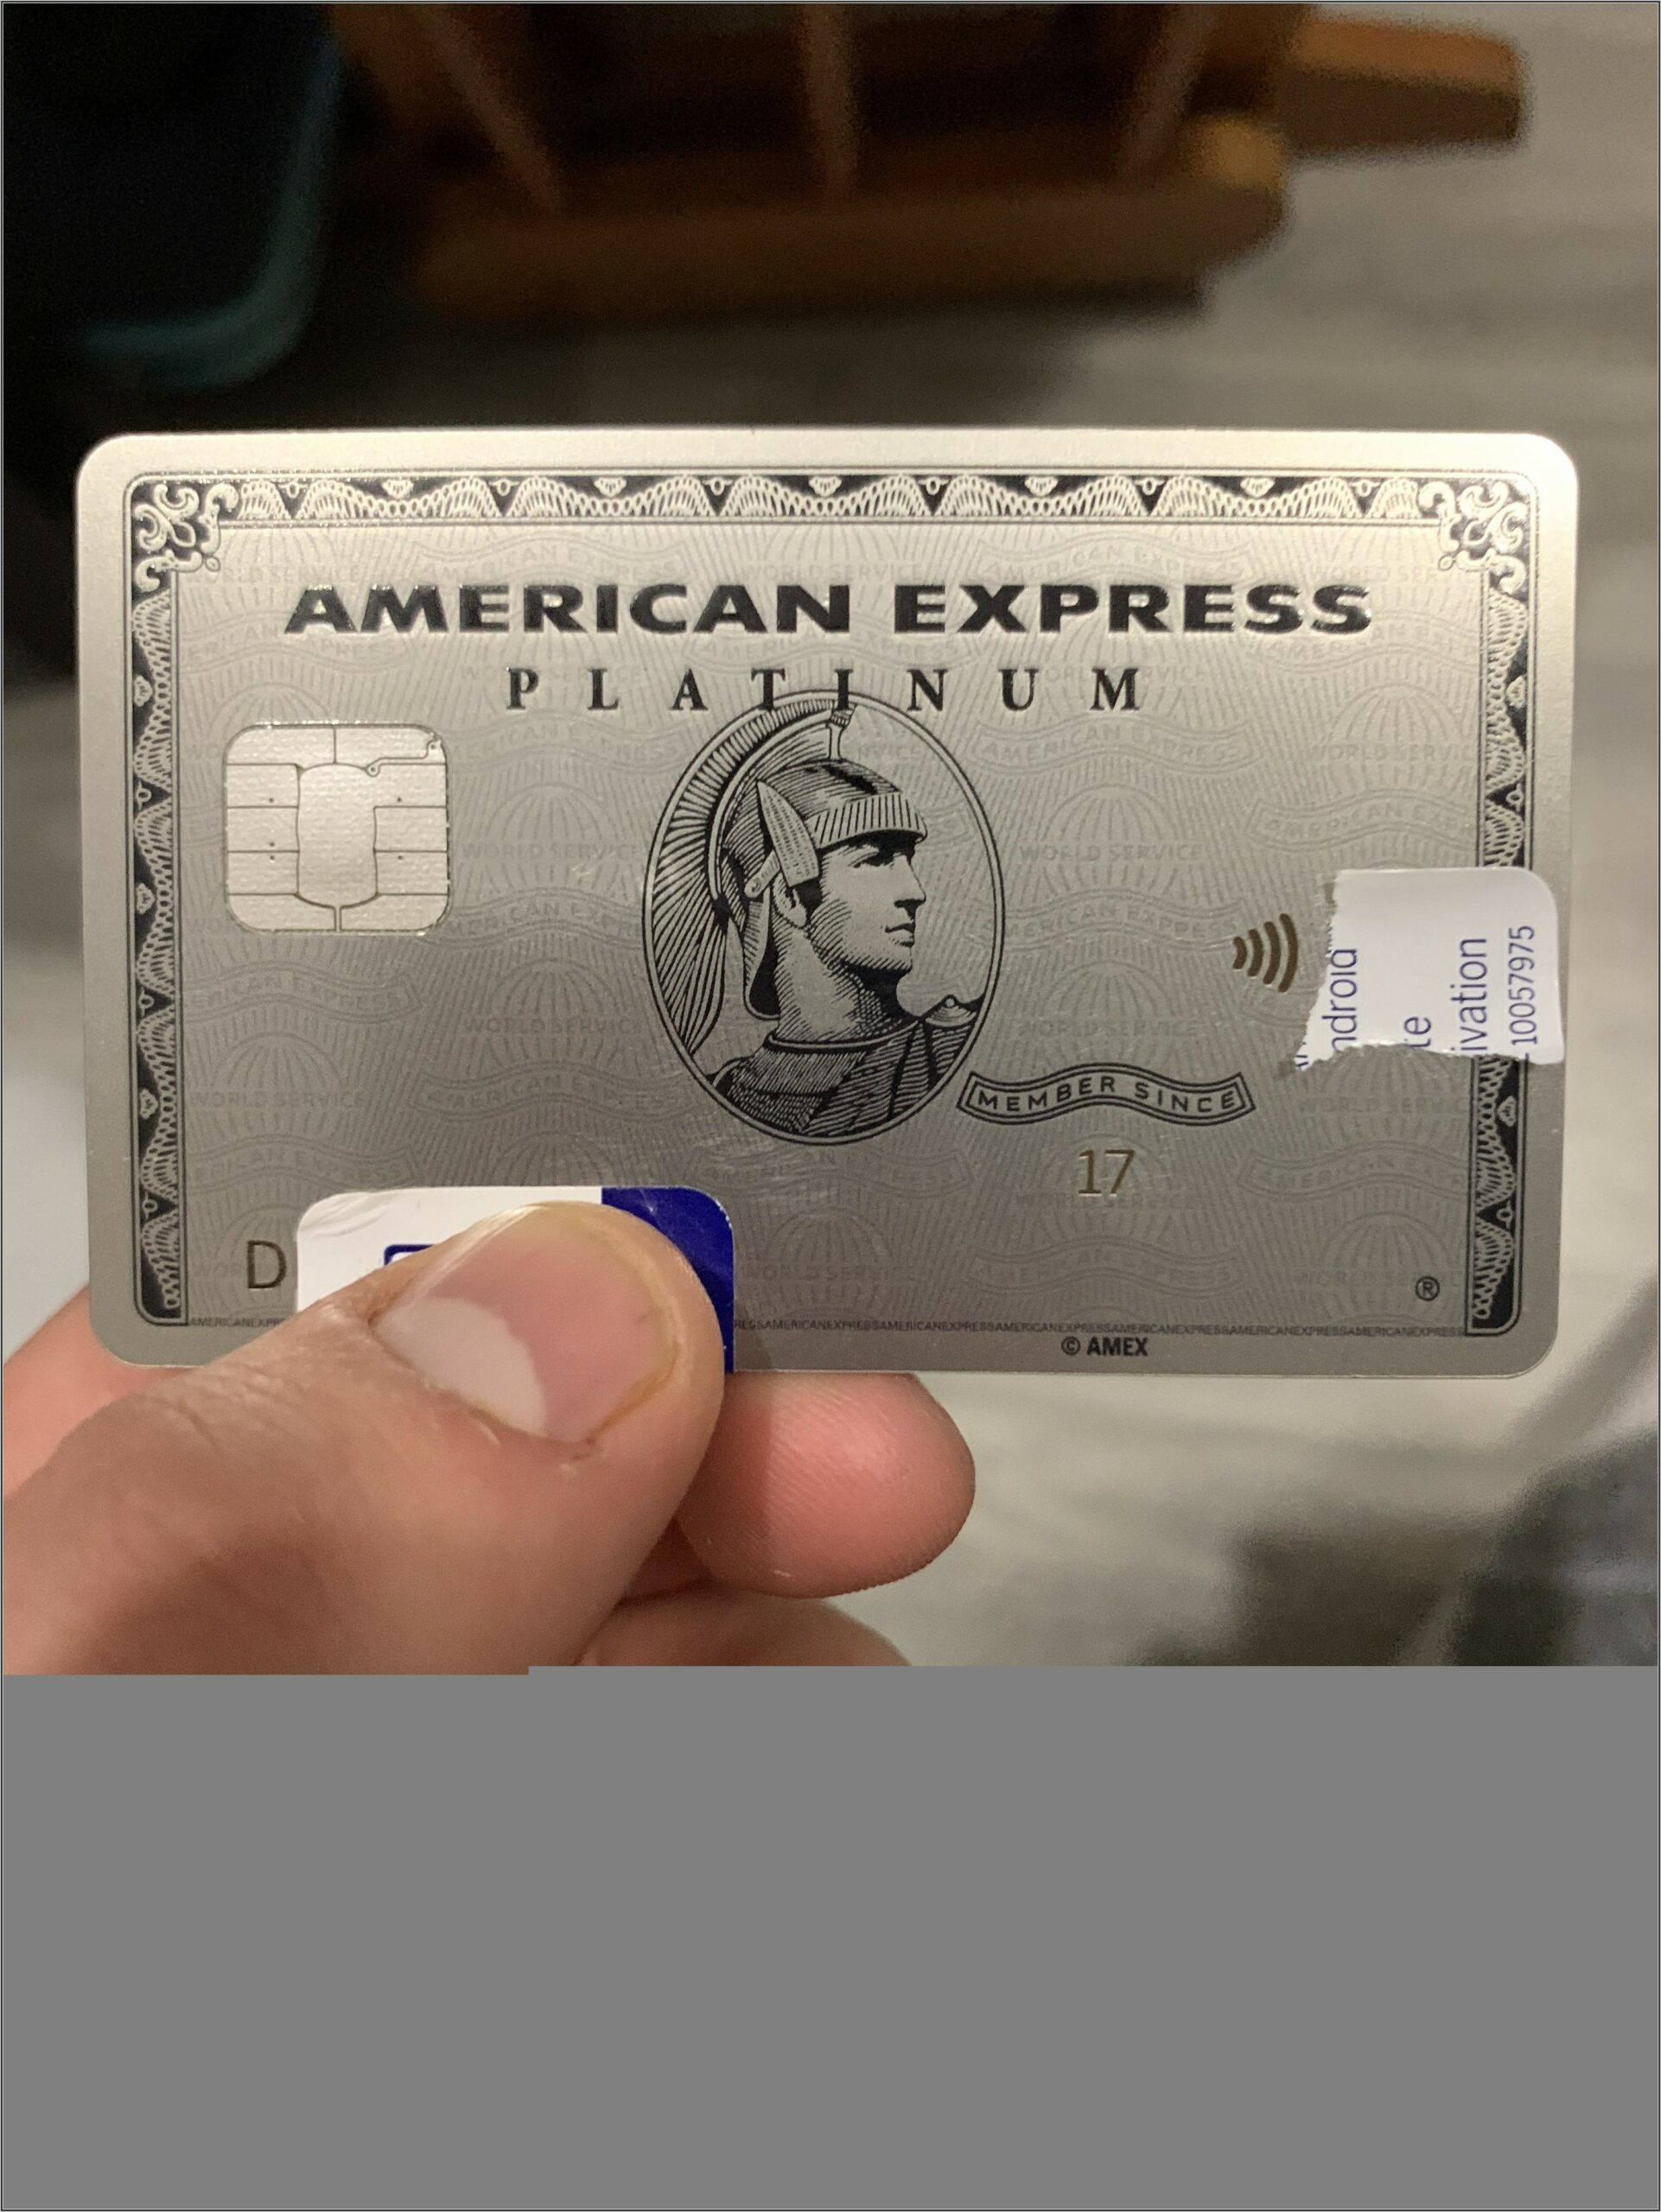 Amex Business Cards Reddit